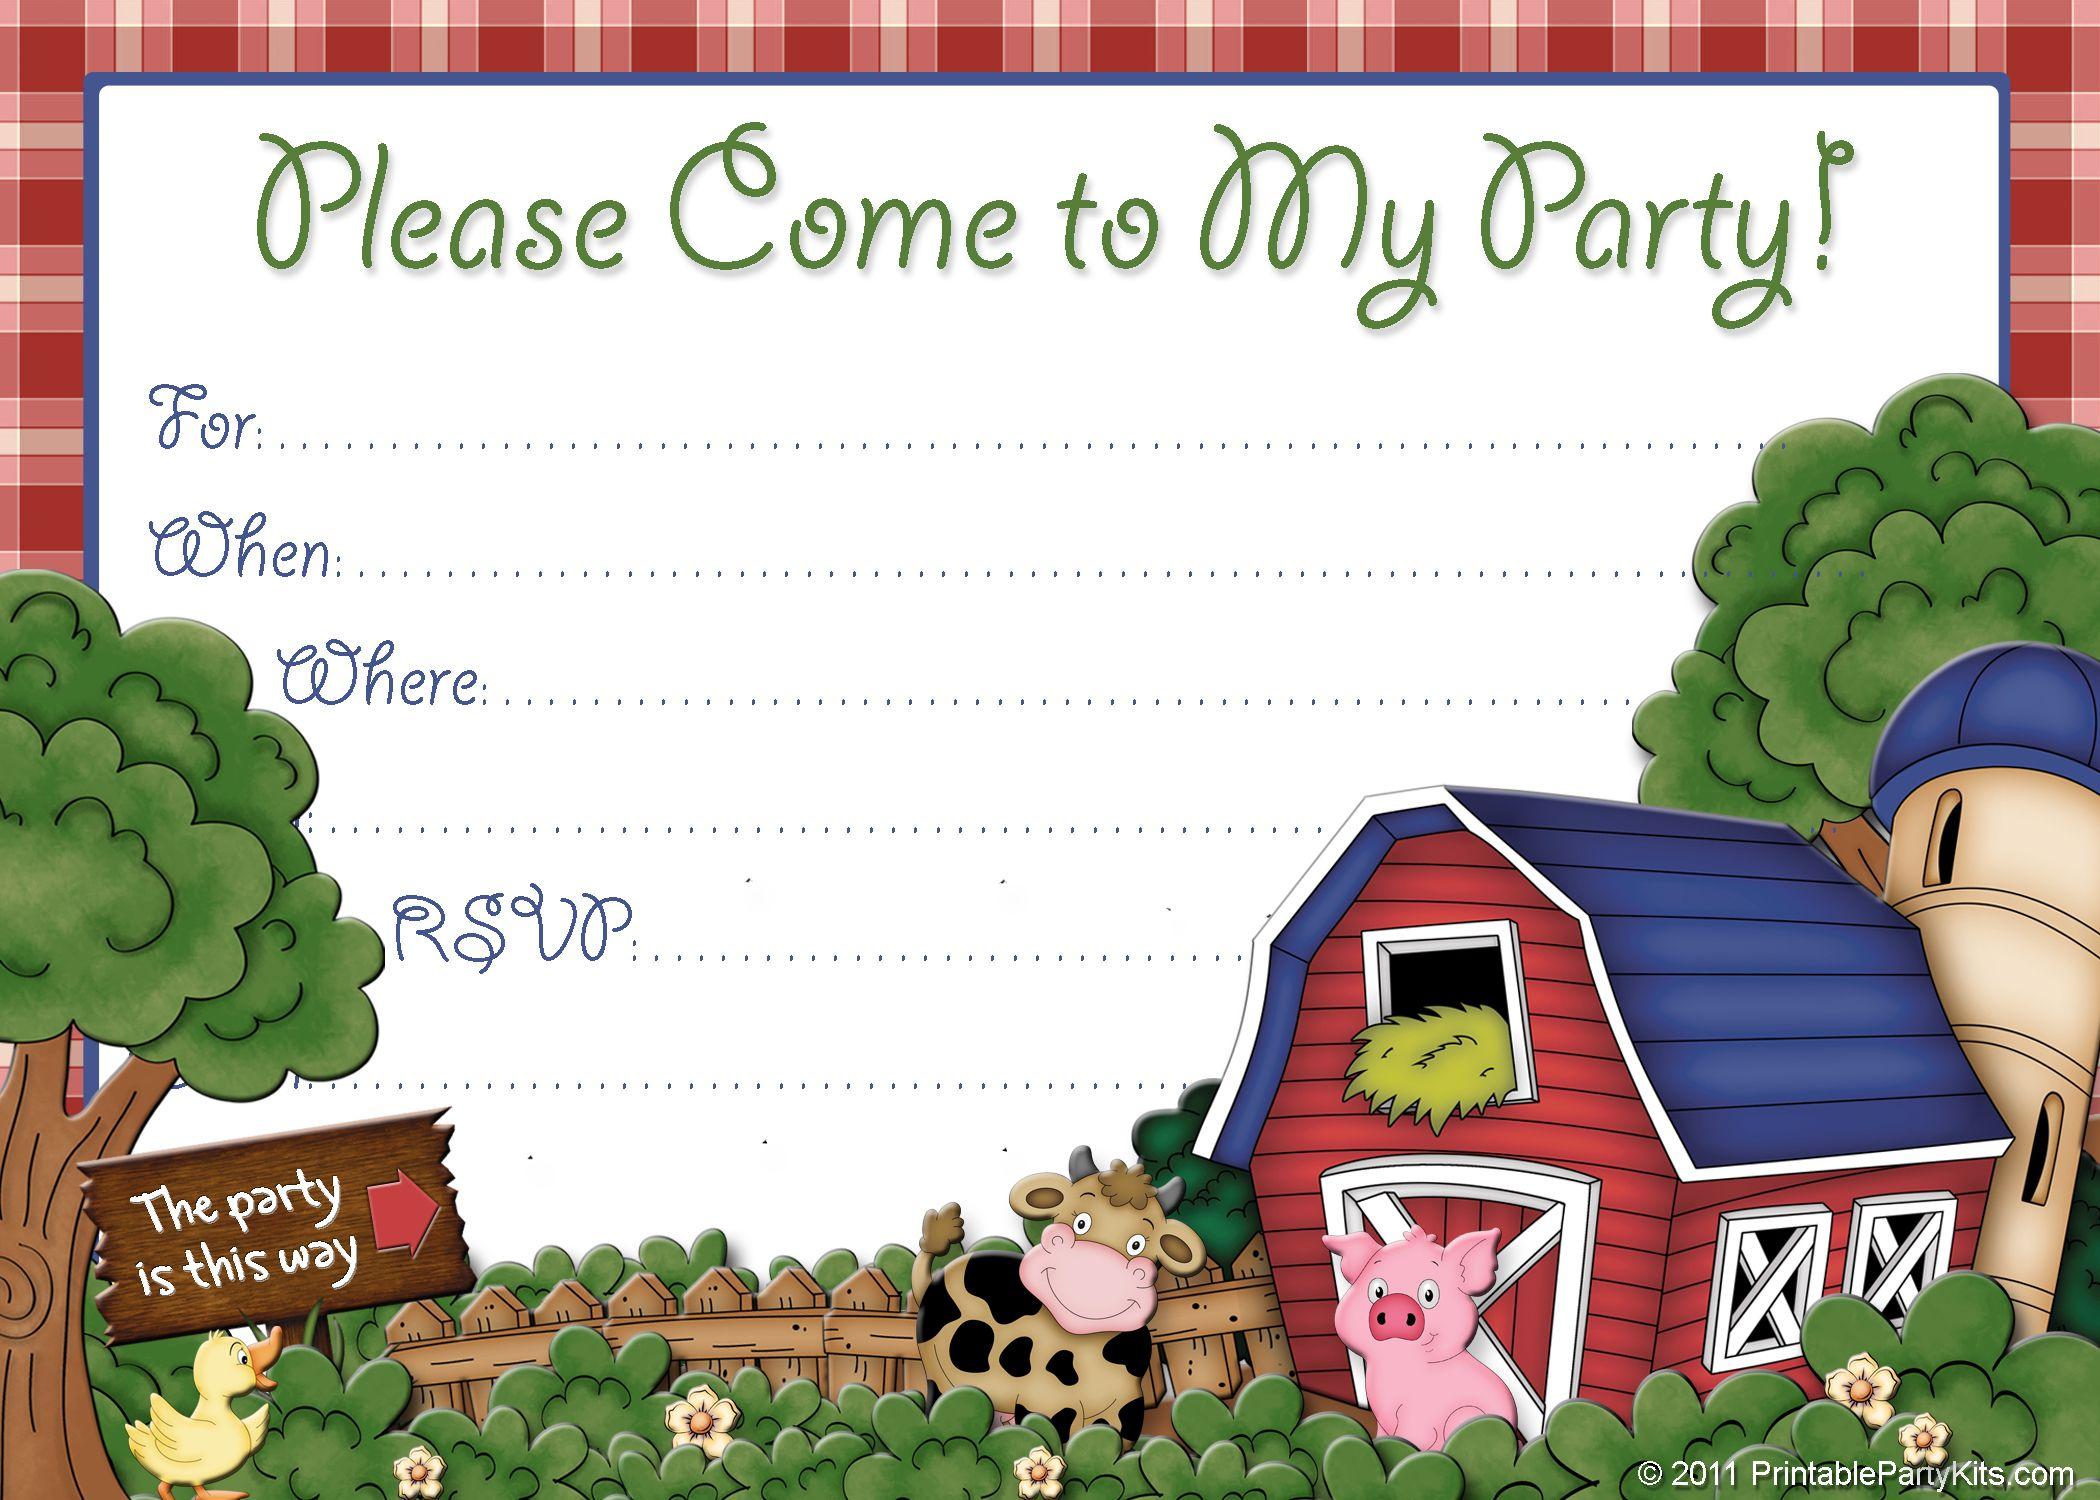 Free Printable Boys Birthday Party Invitations Invitation Cards